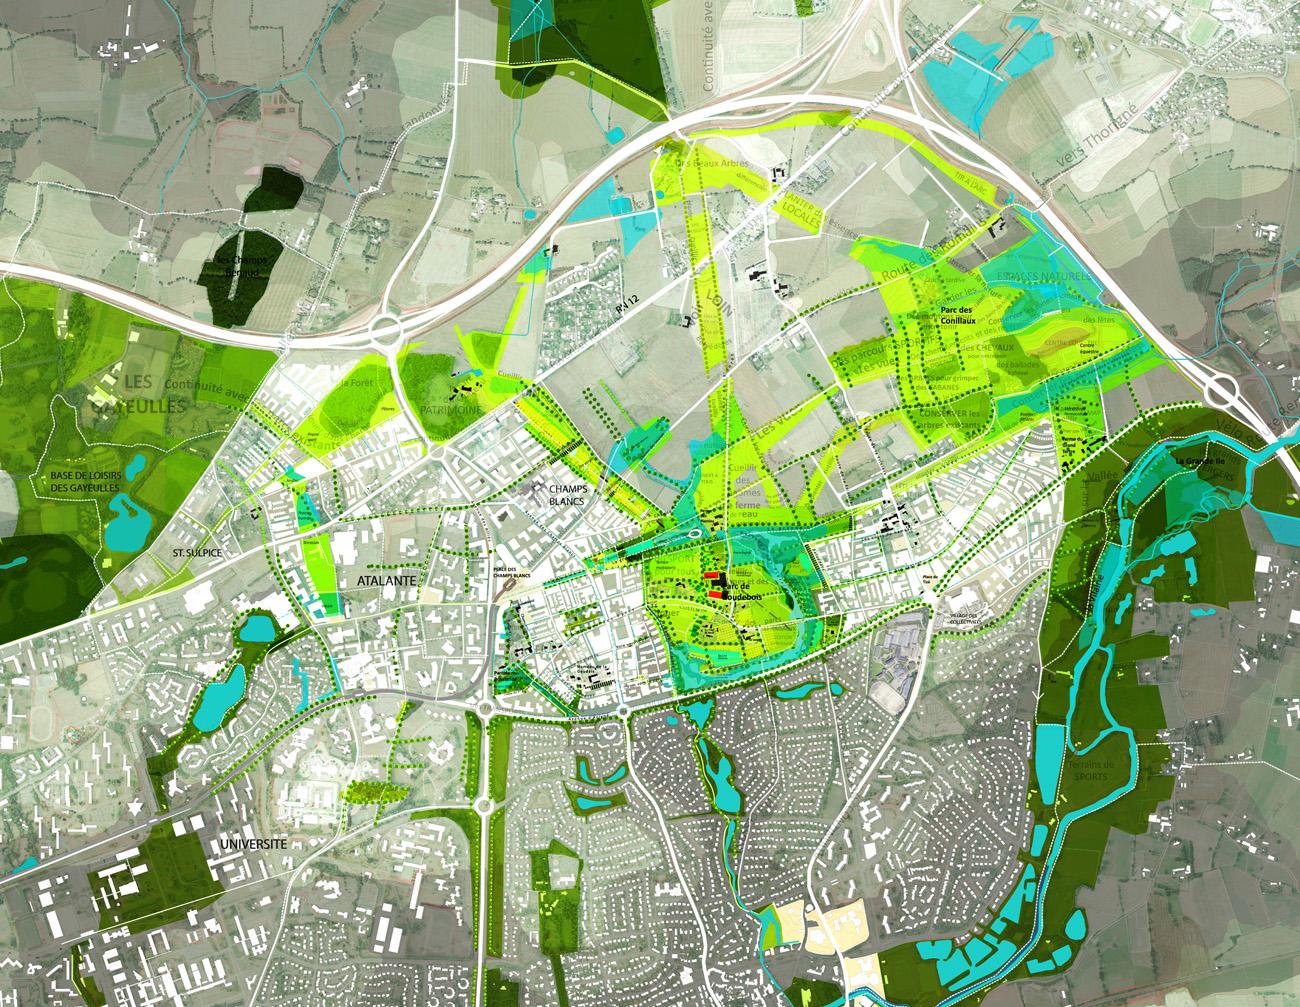 Viasilva - Les Parcs - Plan 1 © Devillers